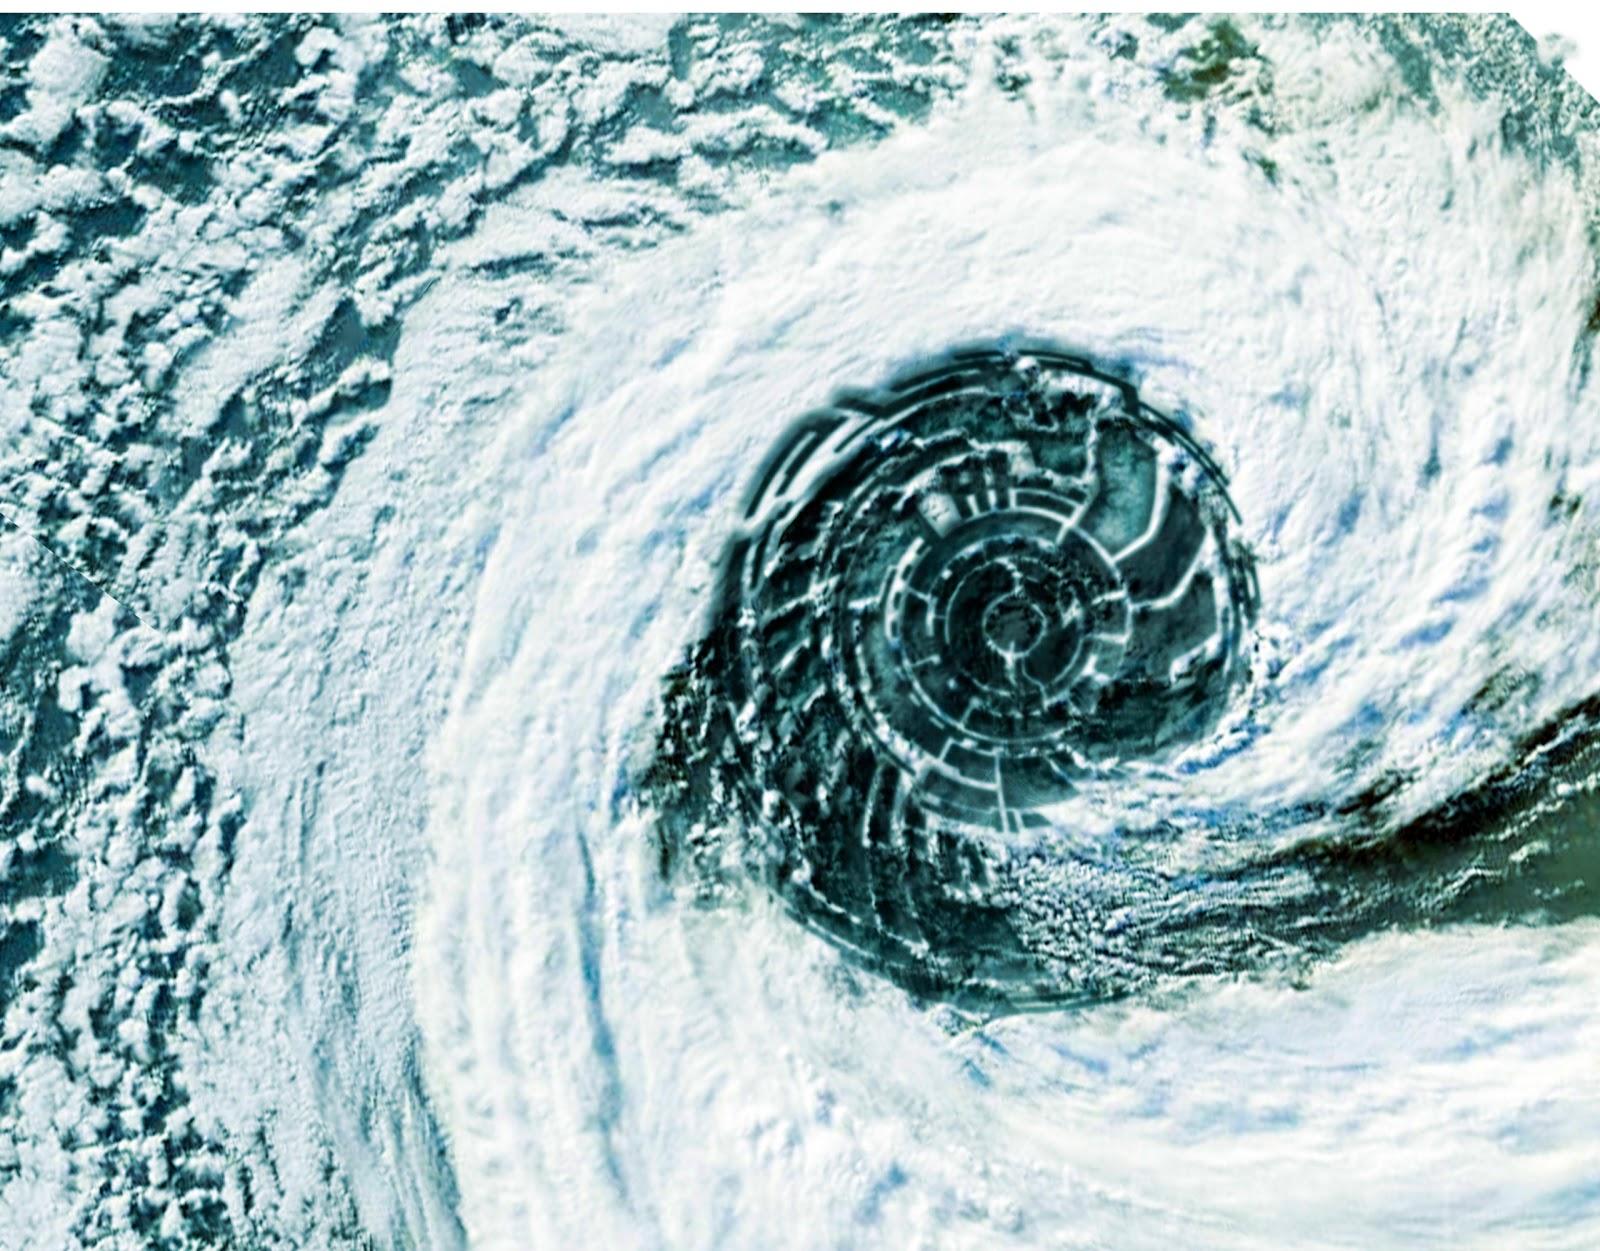 Cryoshell - Breakout FaberFiles_Cryoshell_Hurricane